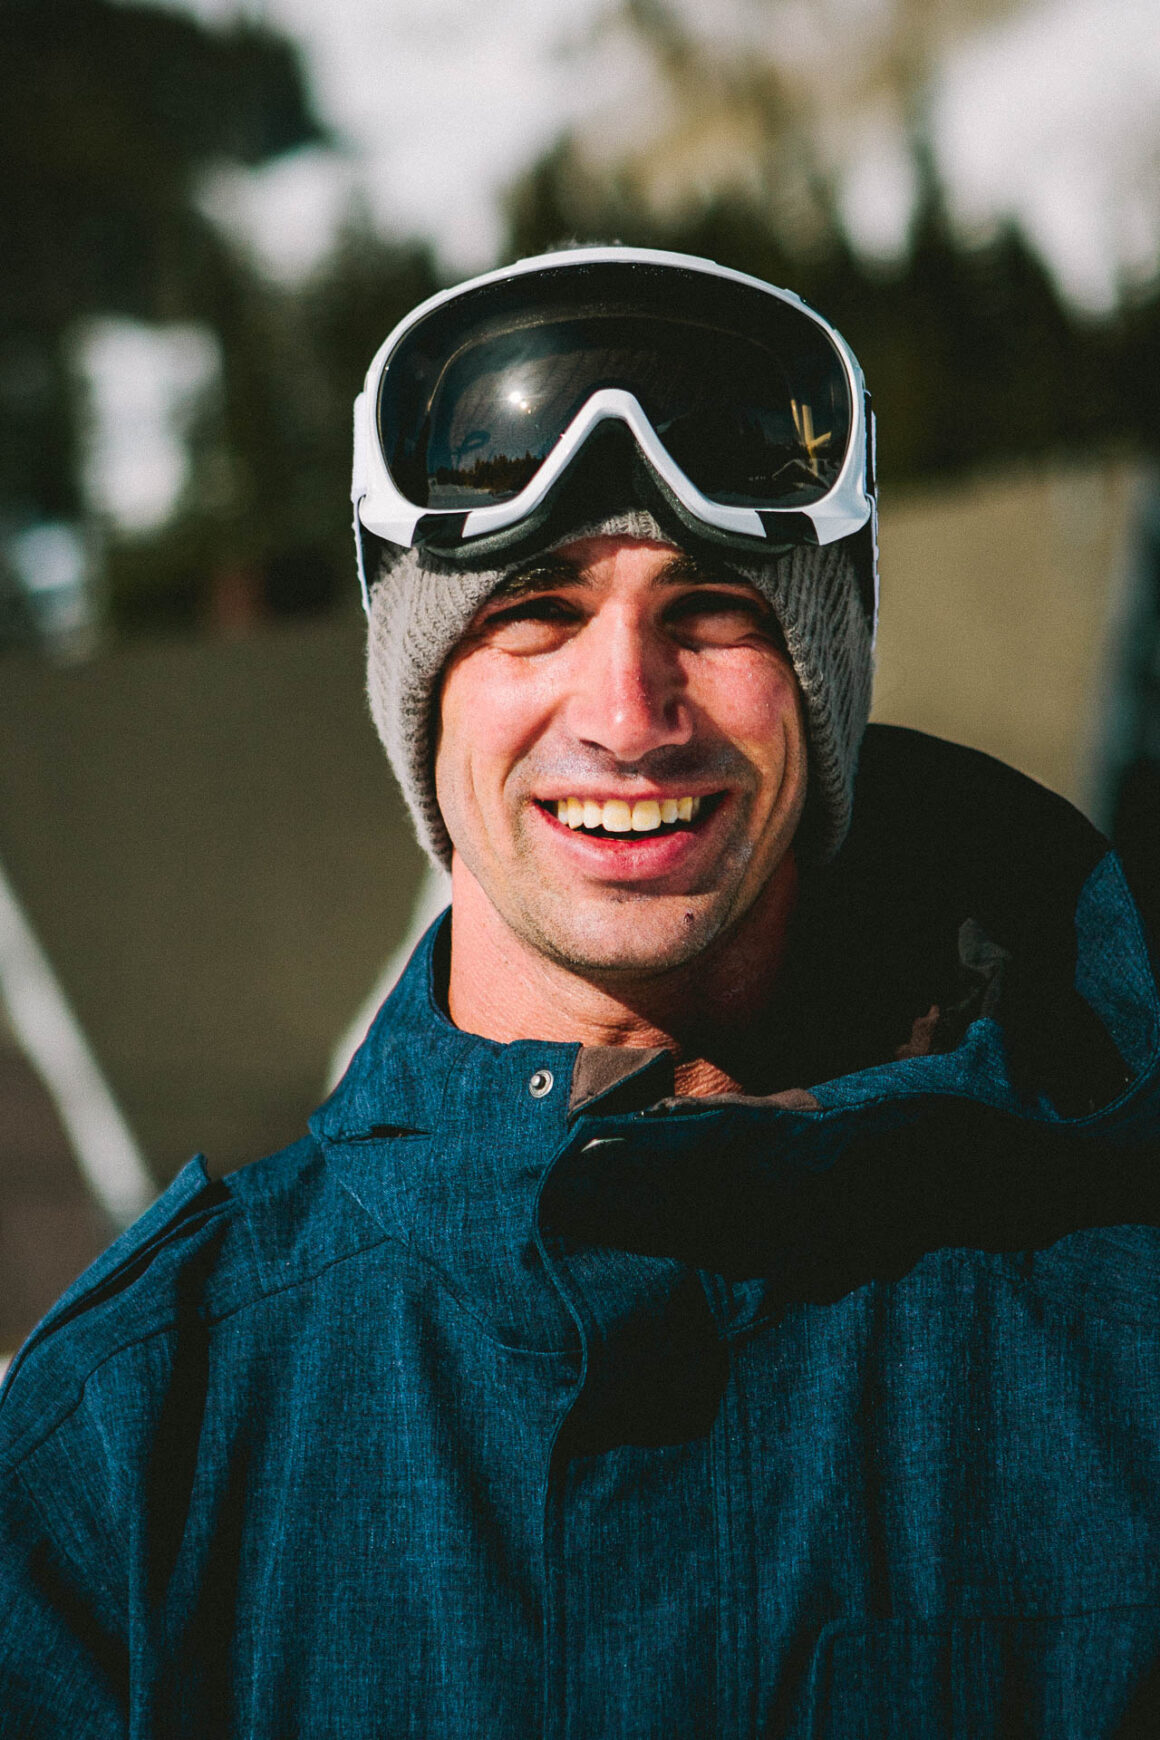 Portrait of Line Skis and JSkis founder, Jason Levinthal